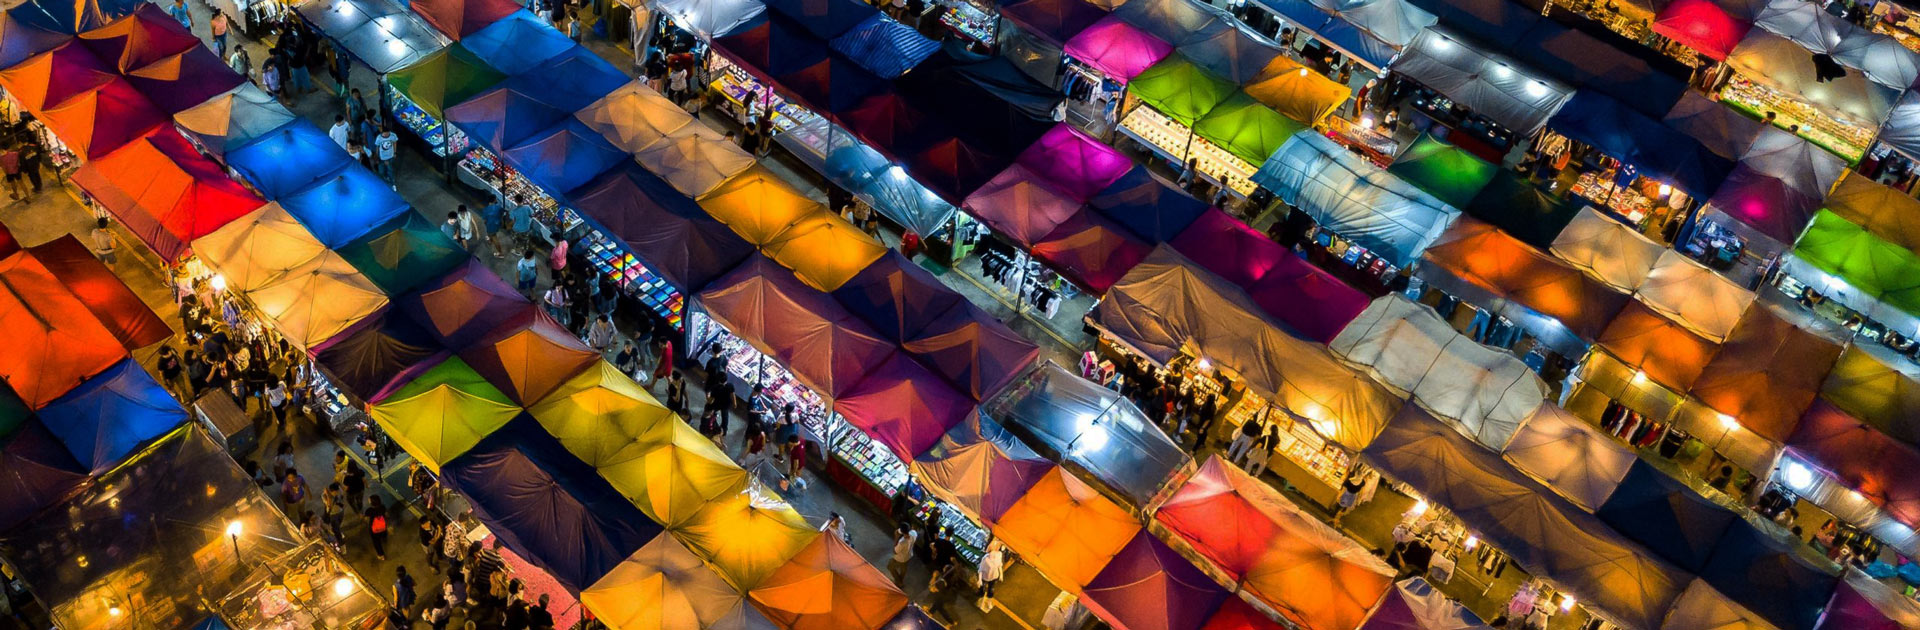 TH BKK Night market d